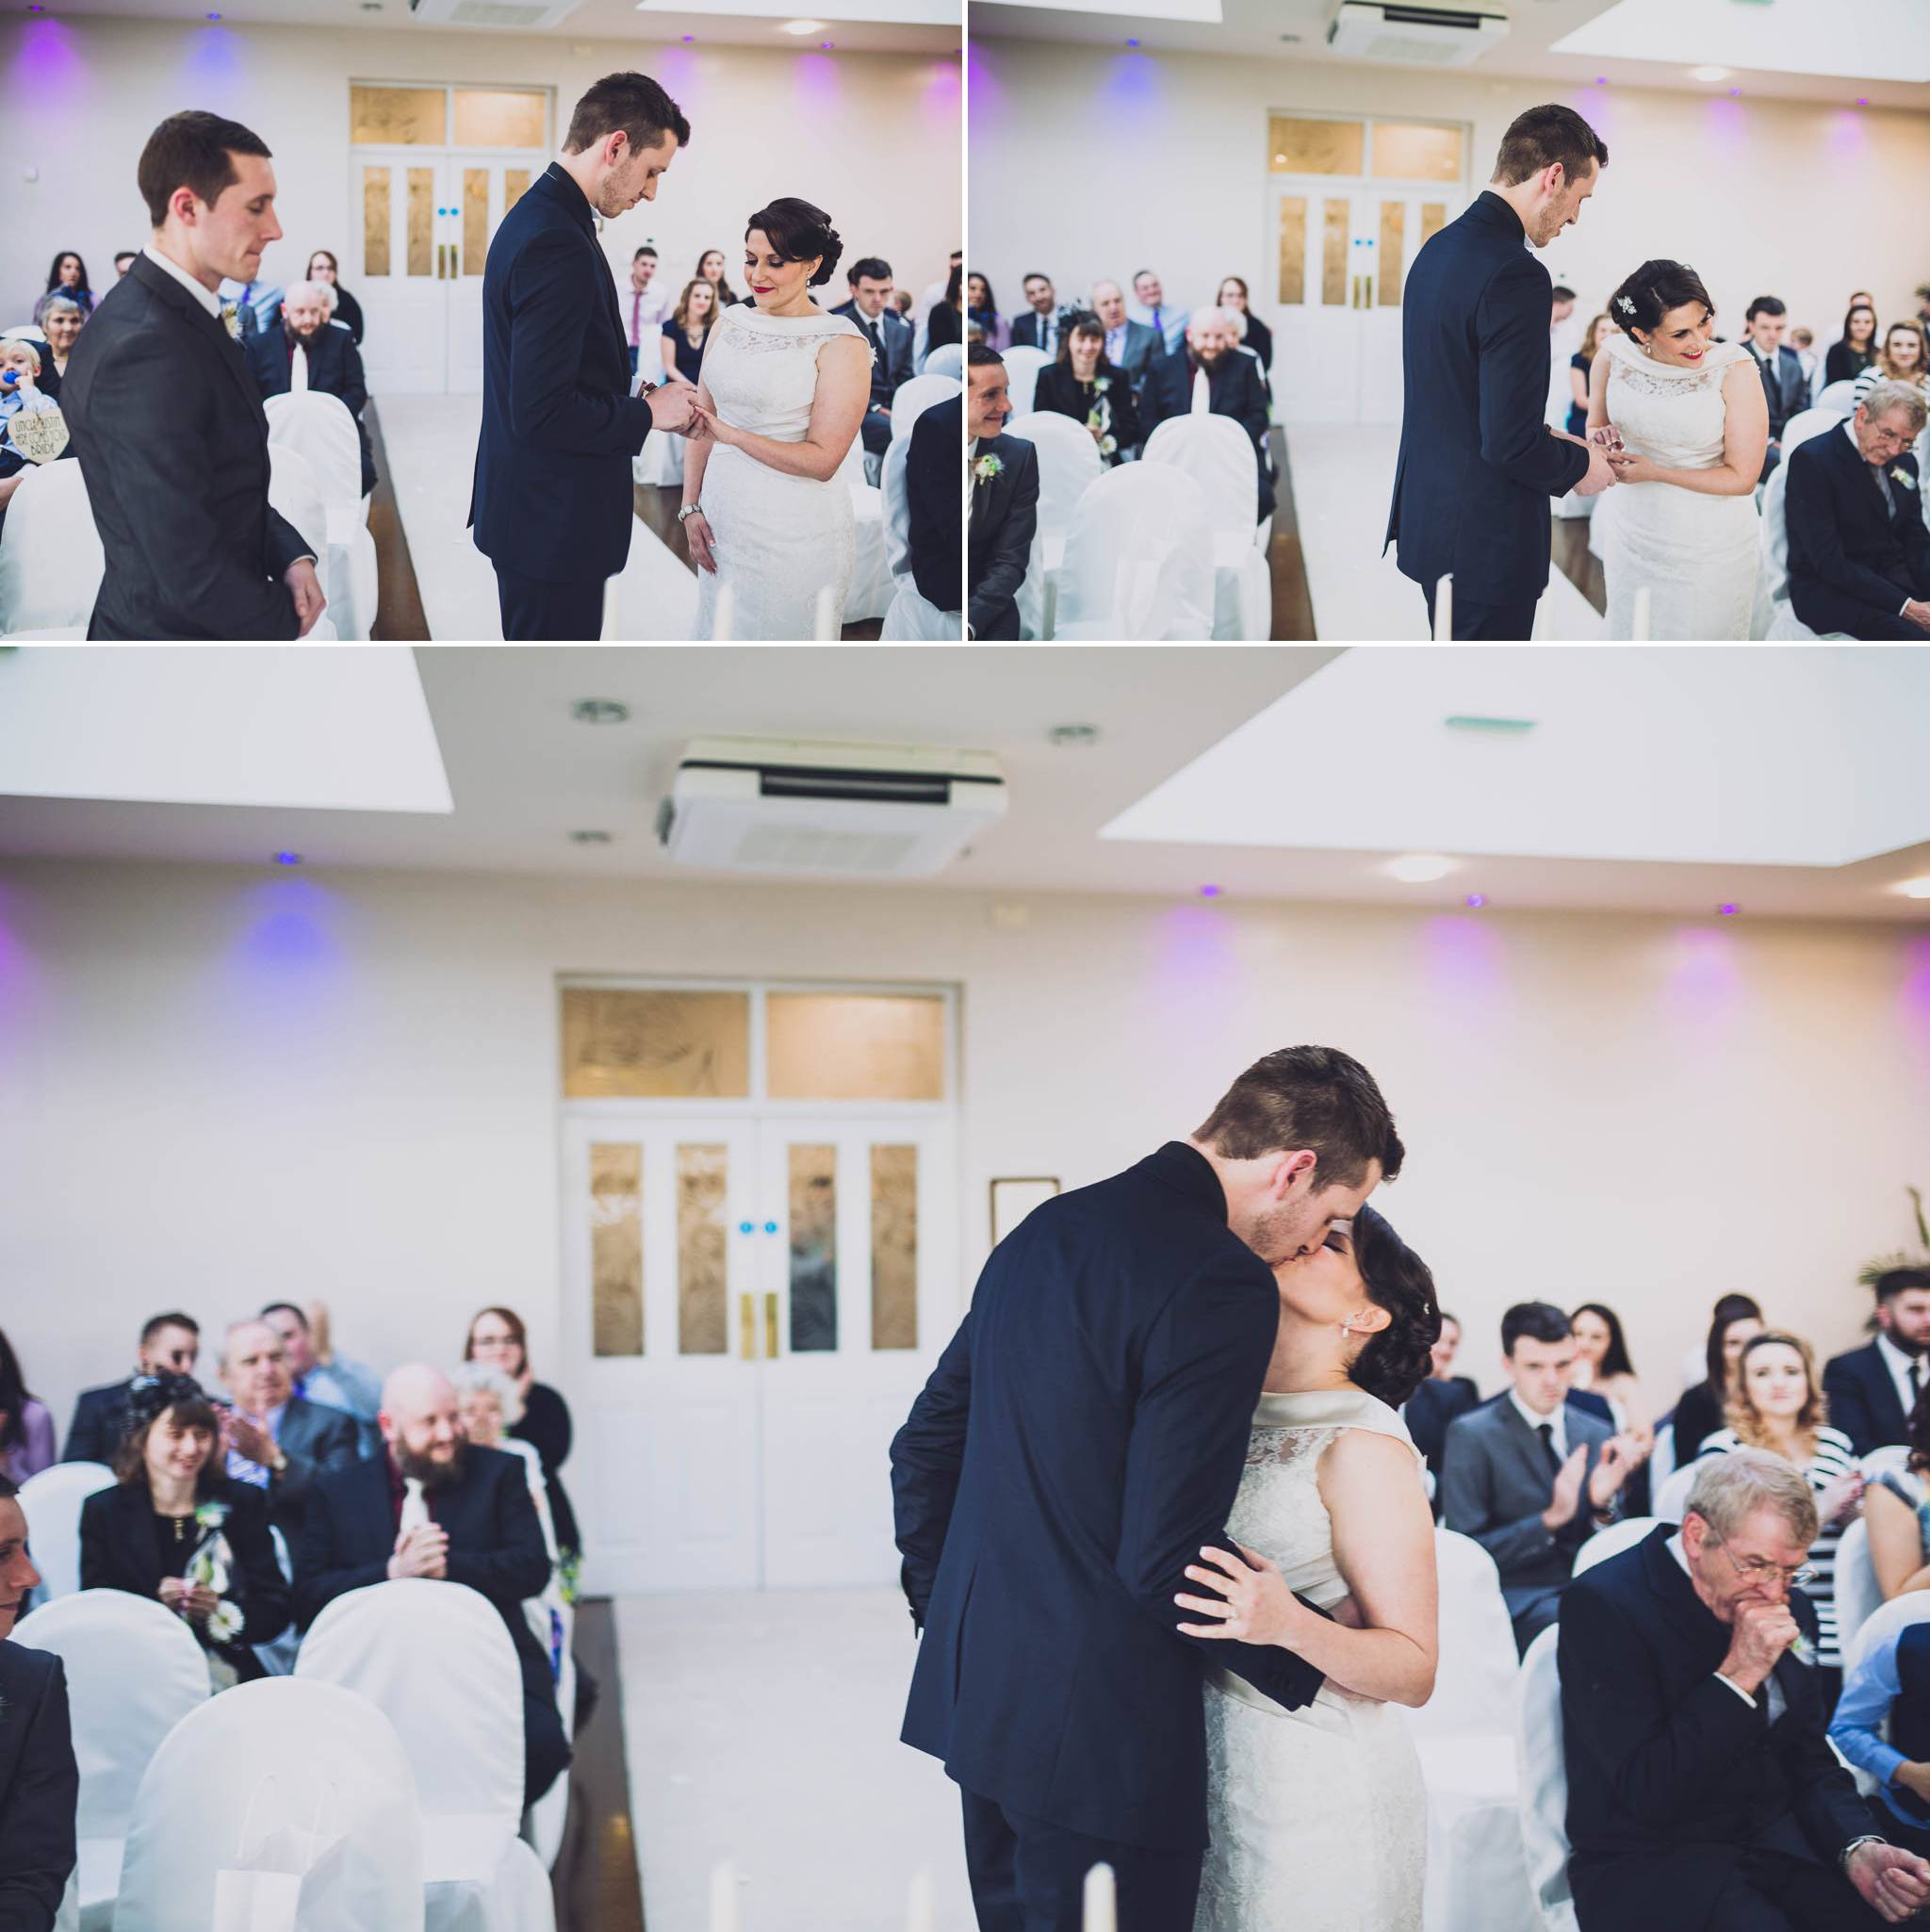 upper-house-wedding-photography 8.jpg